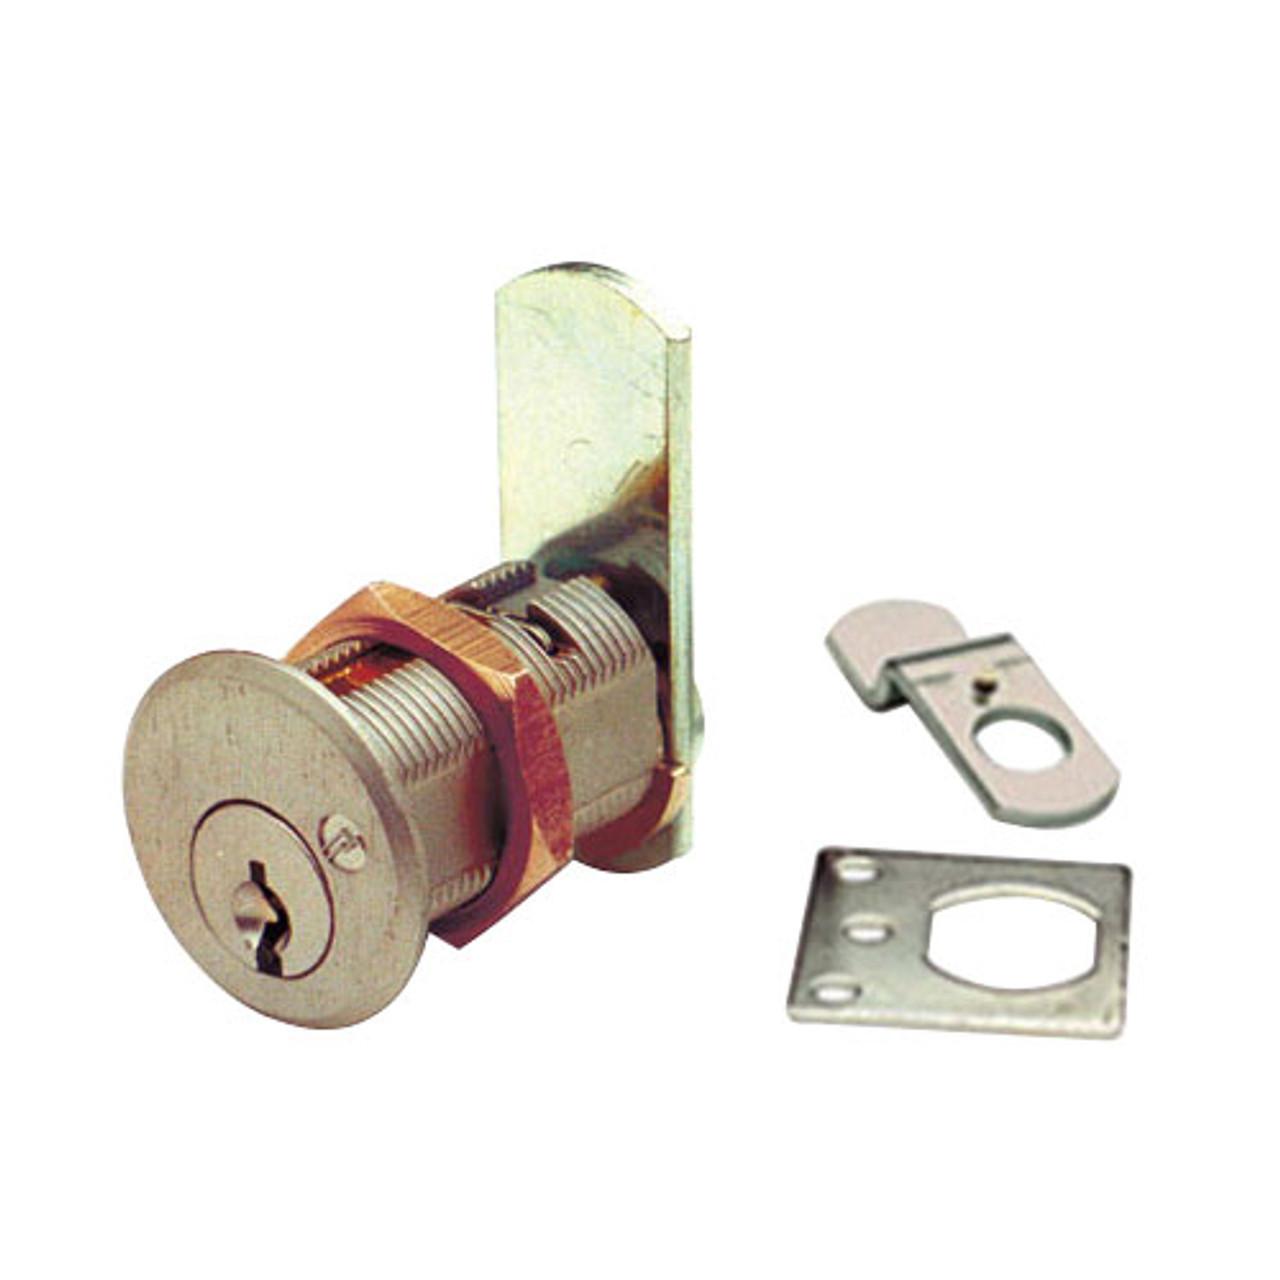 Olympus DCR3-KD-US3 Cam Locks in Bright Brass Finish